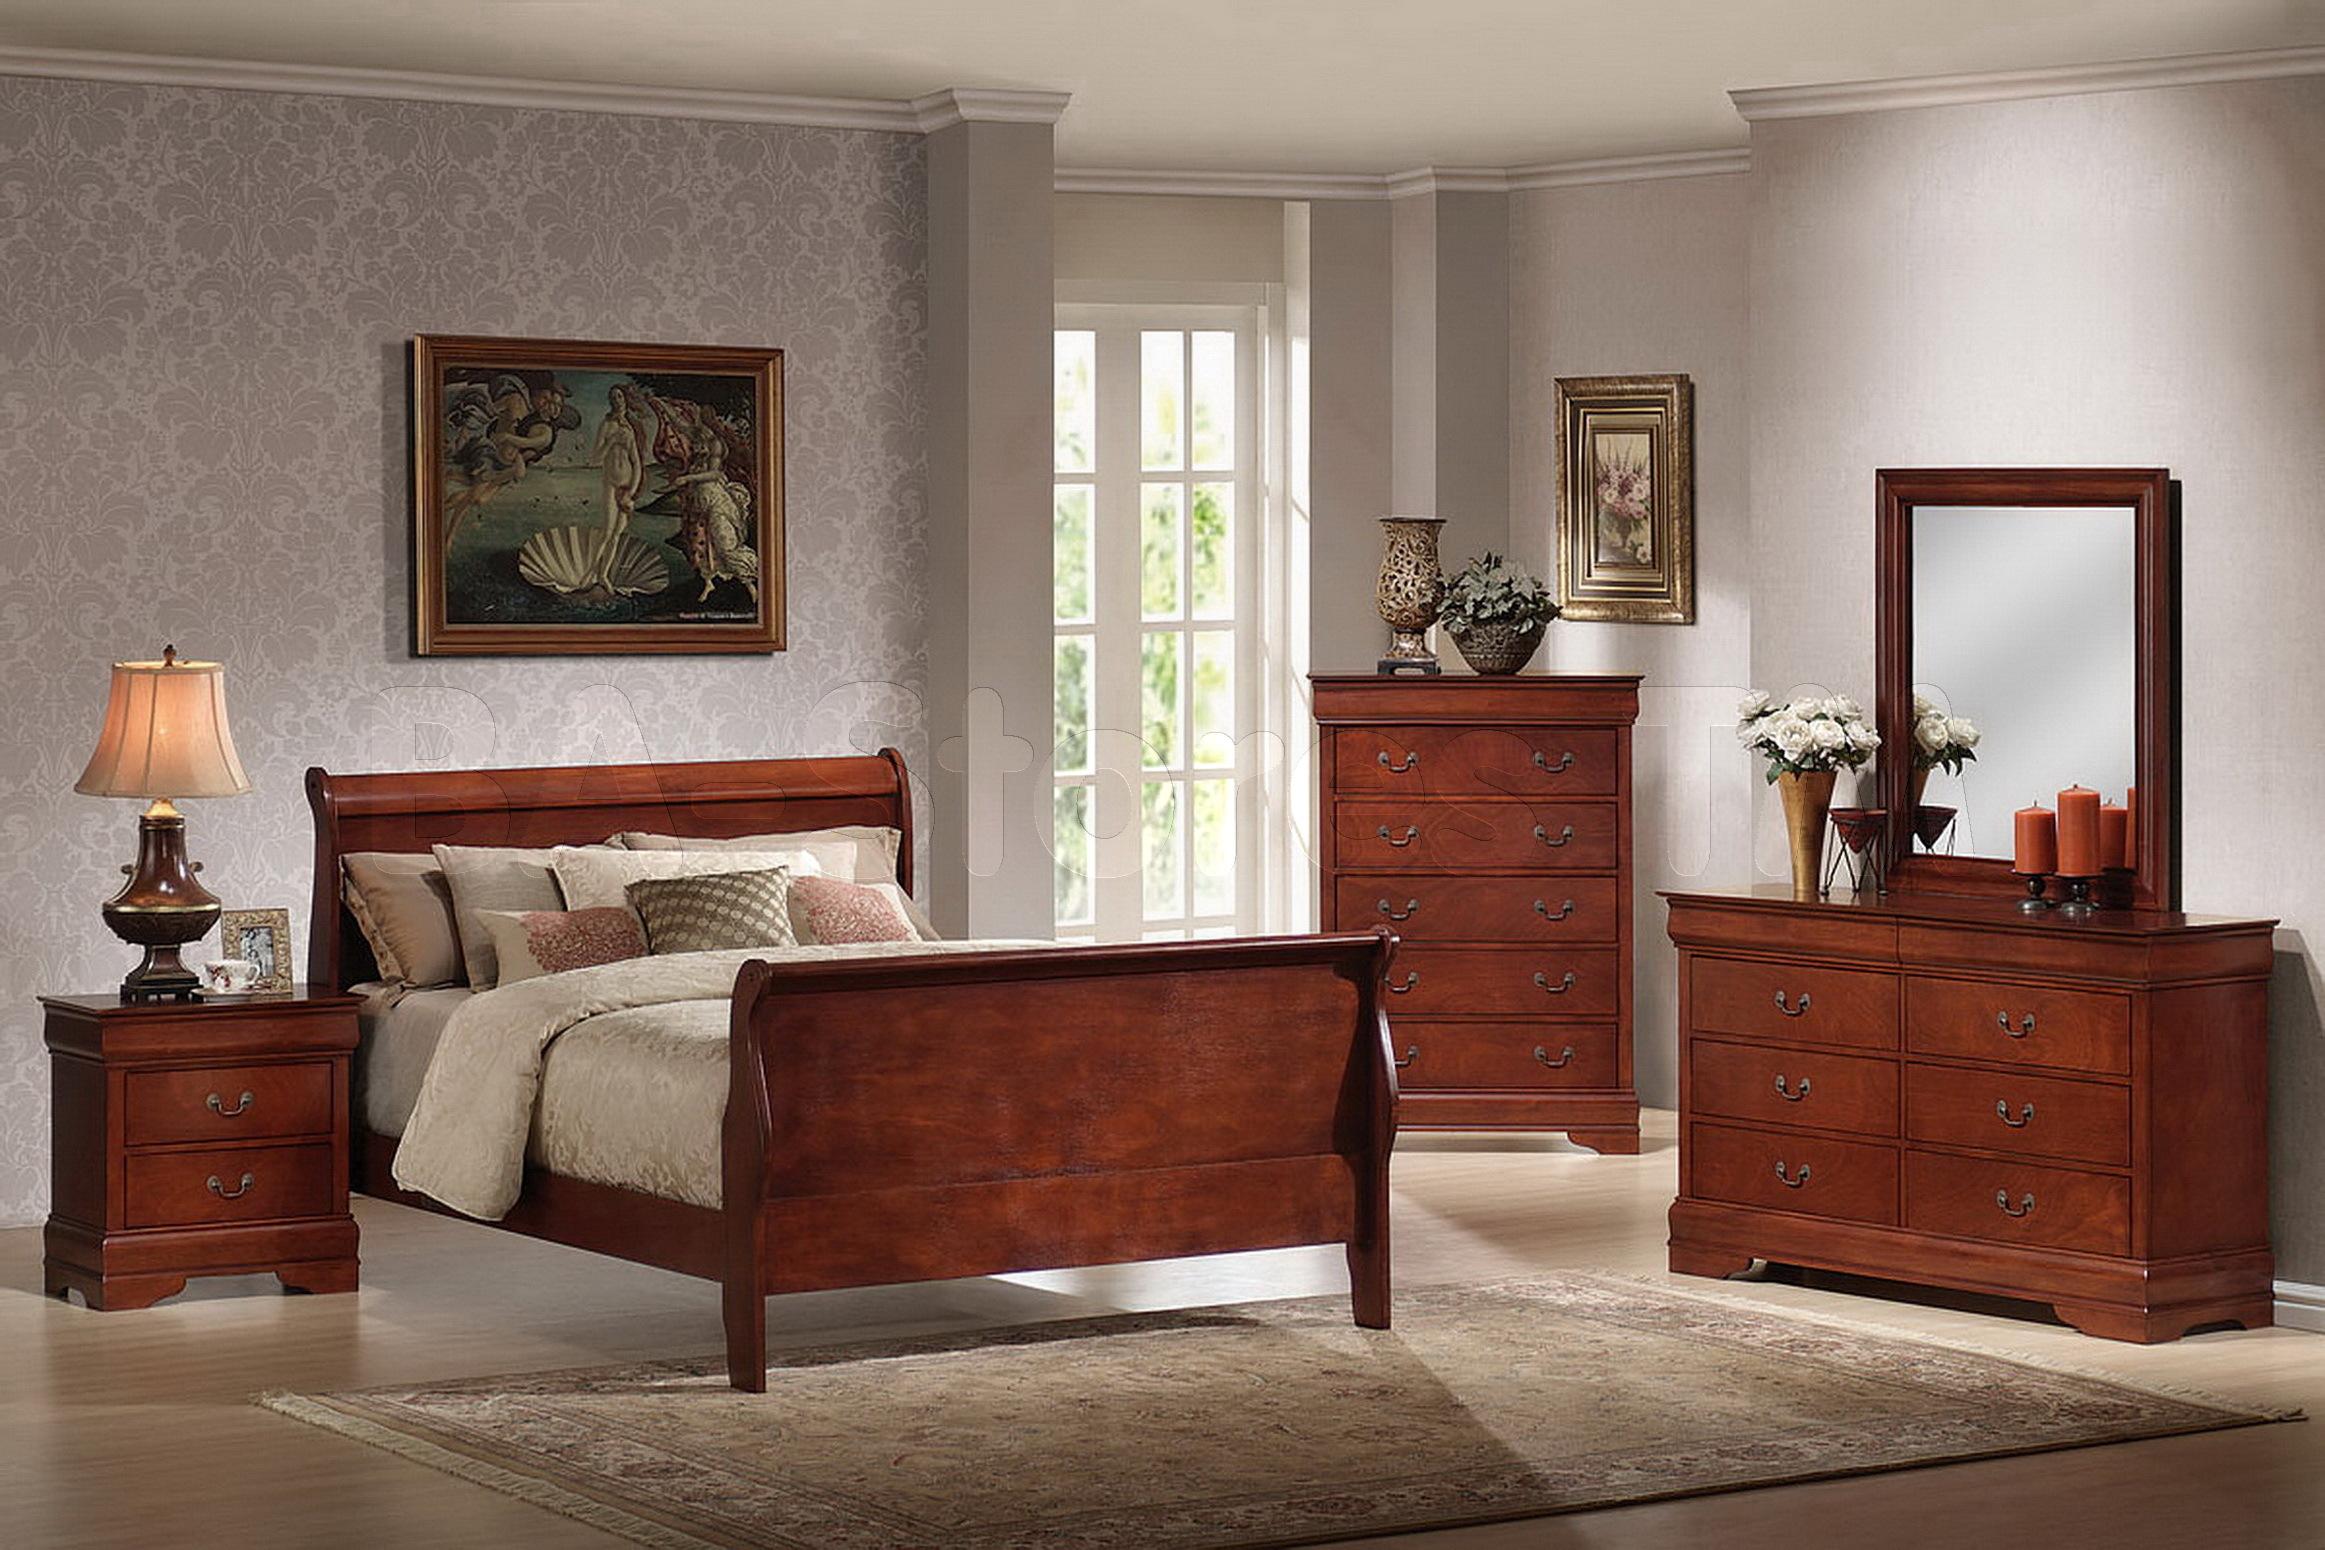 bedroom ideas cherry furniture photo - 3